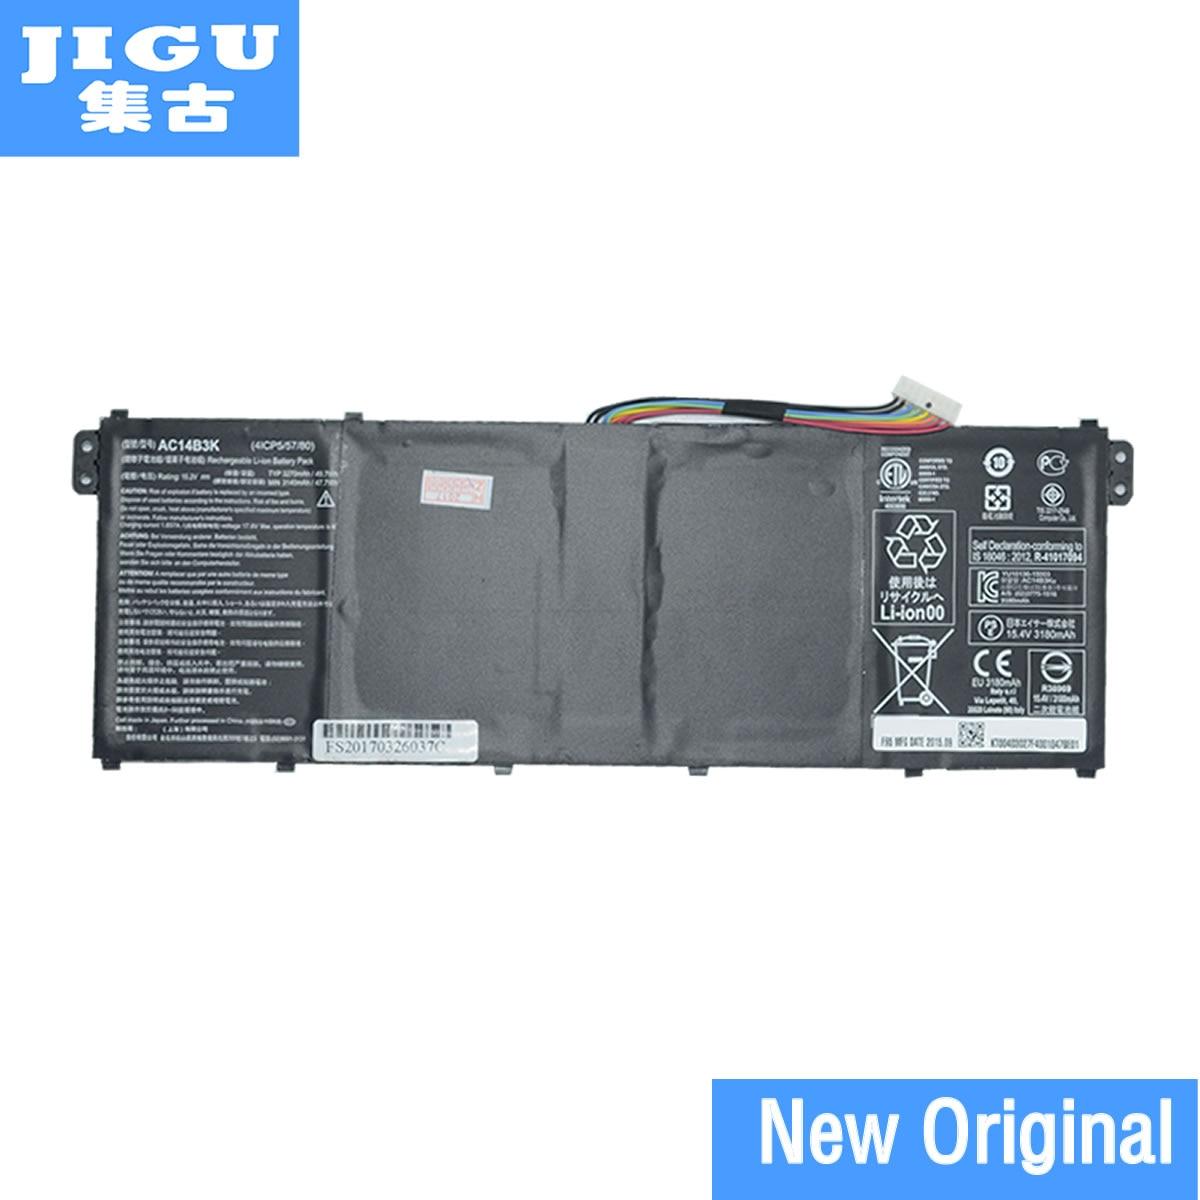 все цены на JIGU Original Laptop Battery AC14B3K FOR ACER A32Aspire R 11 R3-131T R5-571T 571TG S14 Chromebook CB3-511 531 Swift 3 3S F314-51